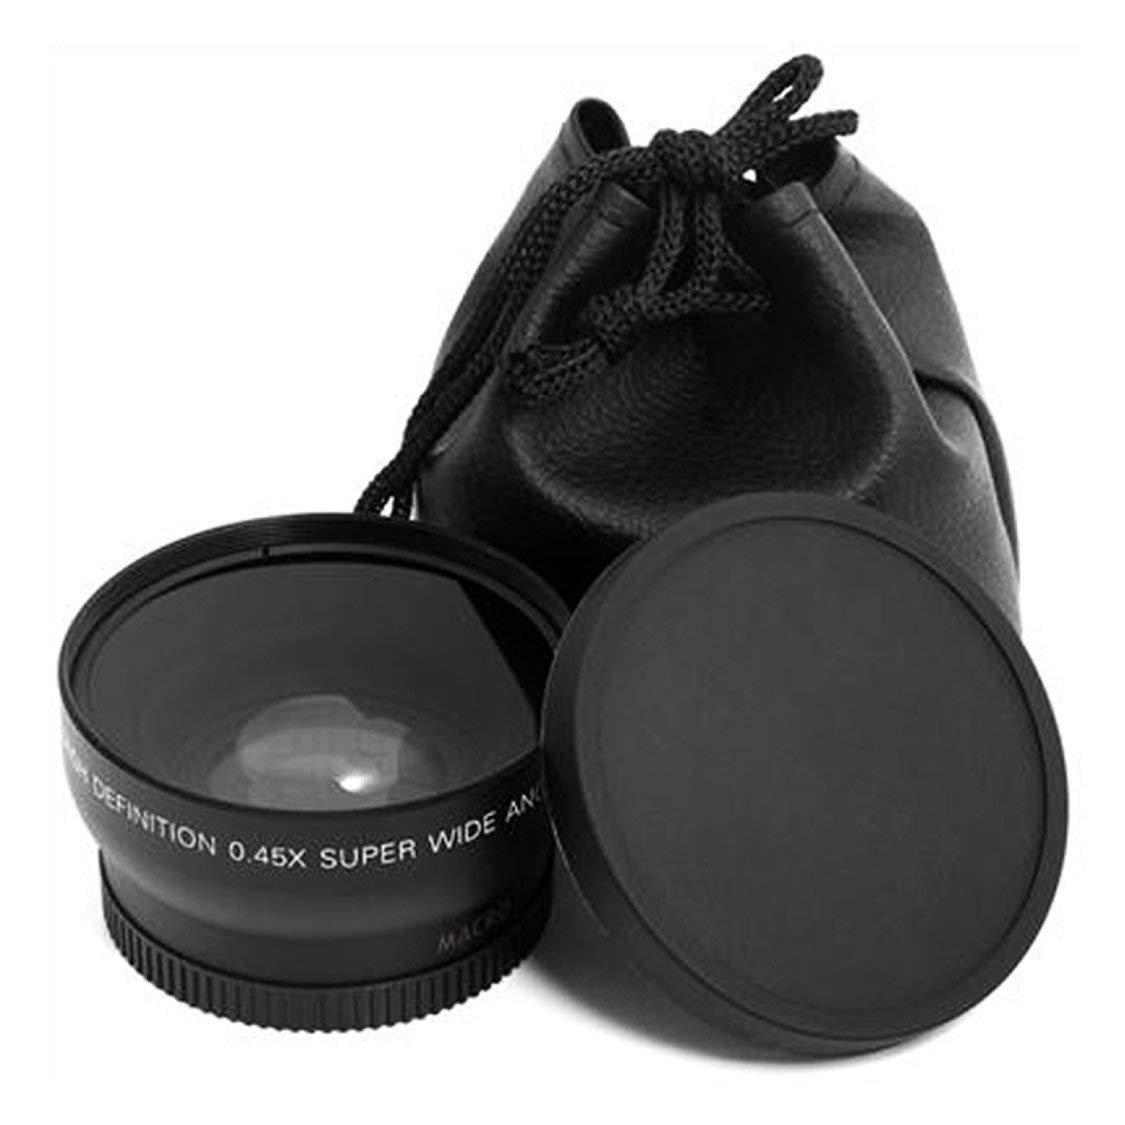 Berufs 52MM 0.45 x Weitwinkelmakro-Objektiv f/ür Nikon D3200 D3100 D5200 D5100 Schwarz Super Weitwinkel